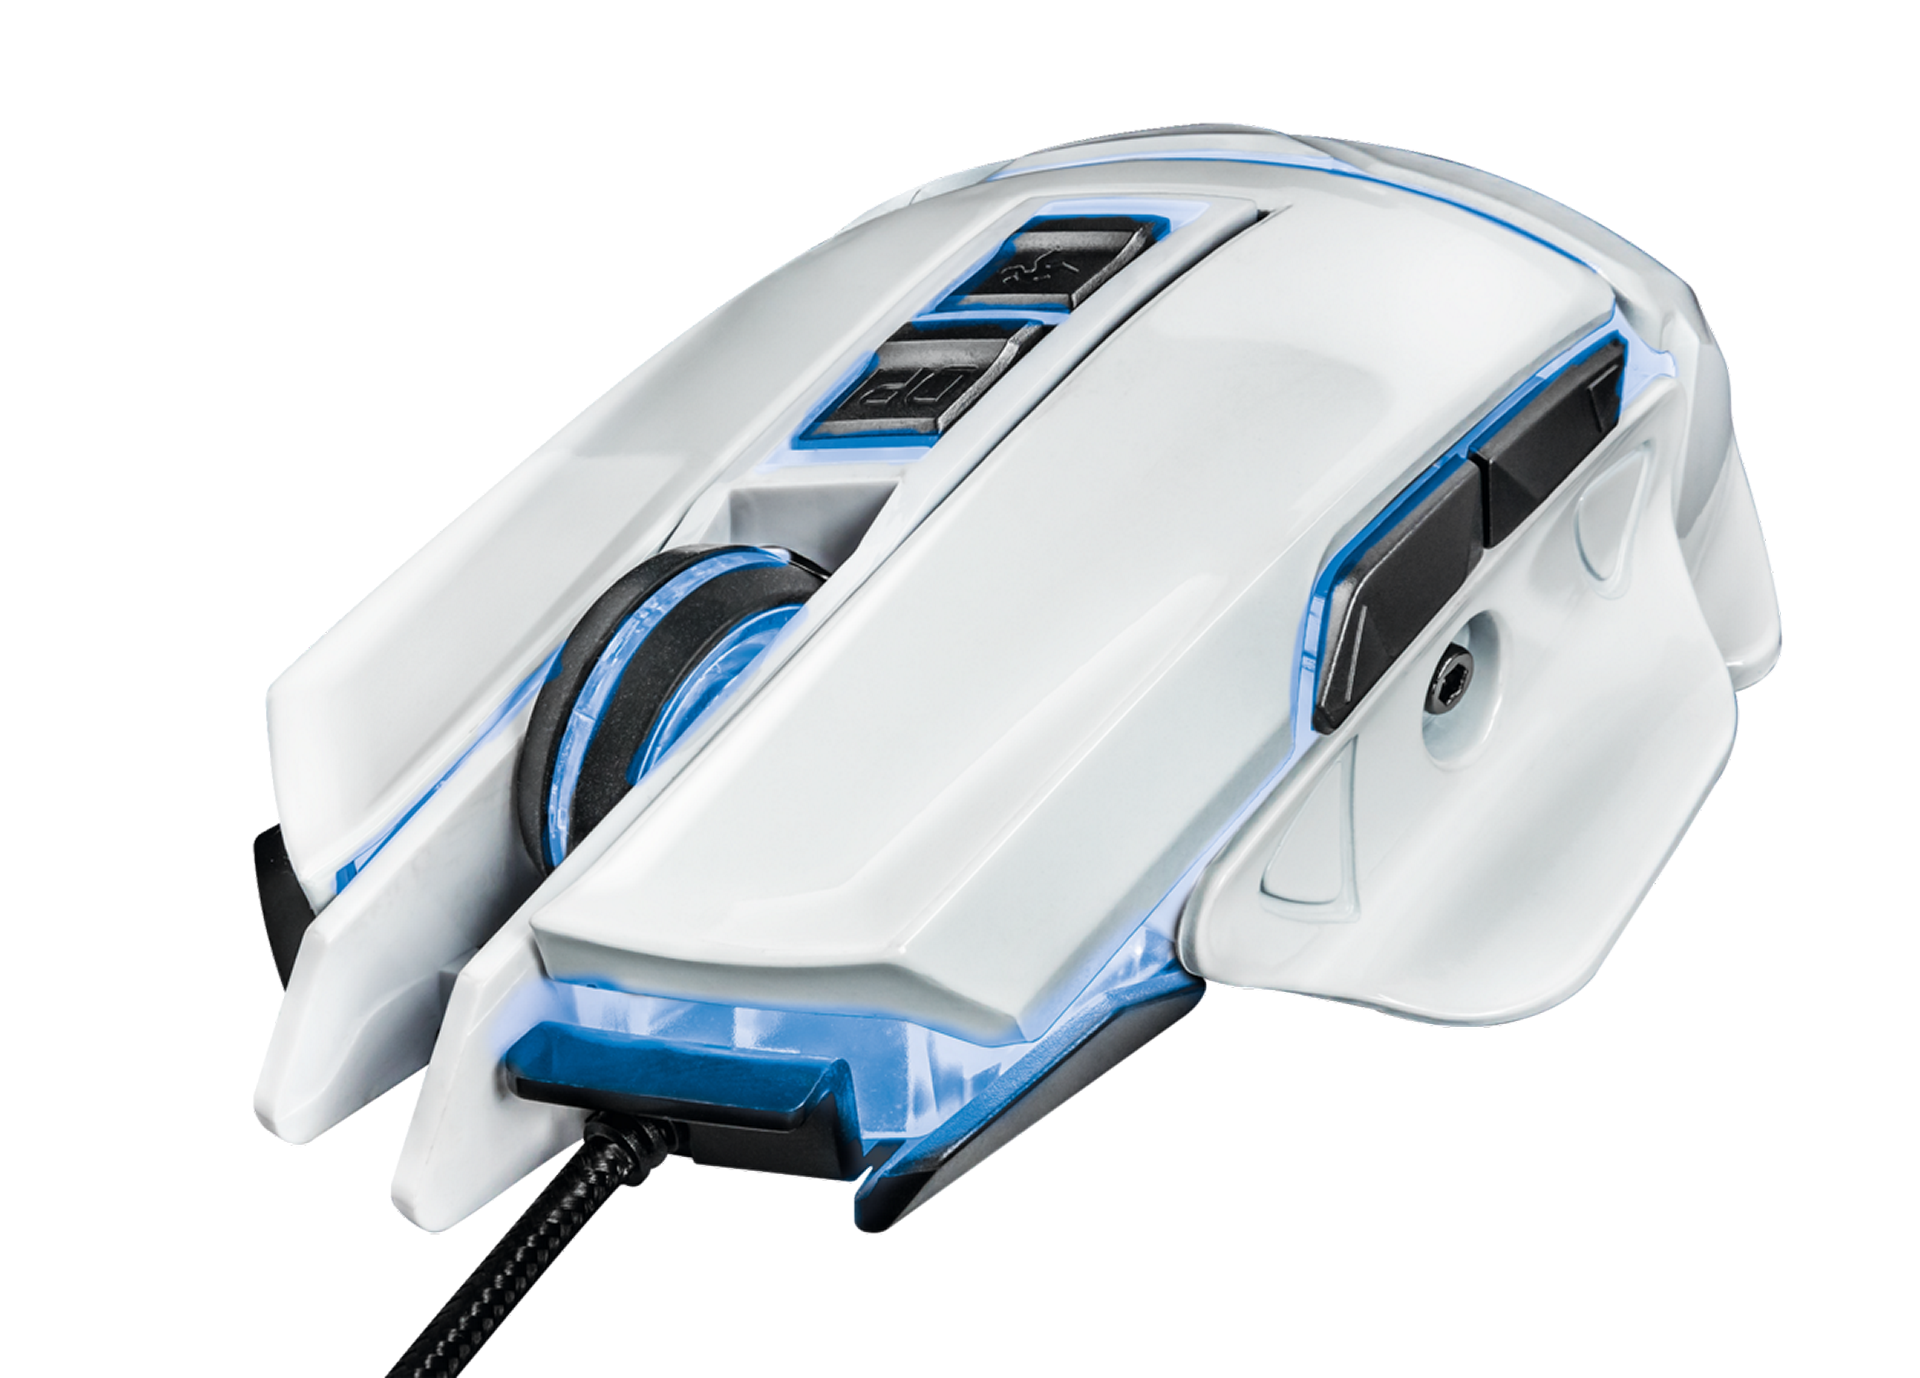 myš TRUST GXT 154 Falx Illuminated Mouse